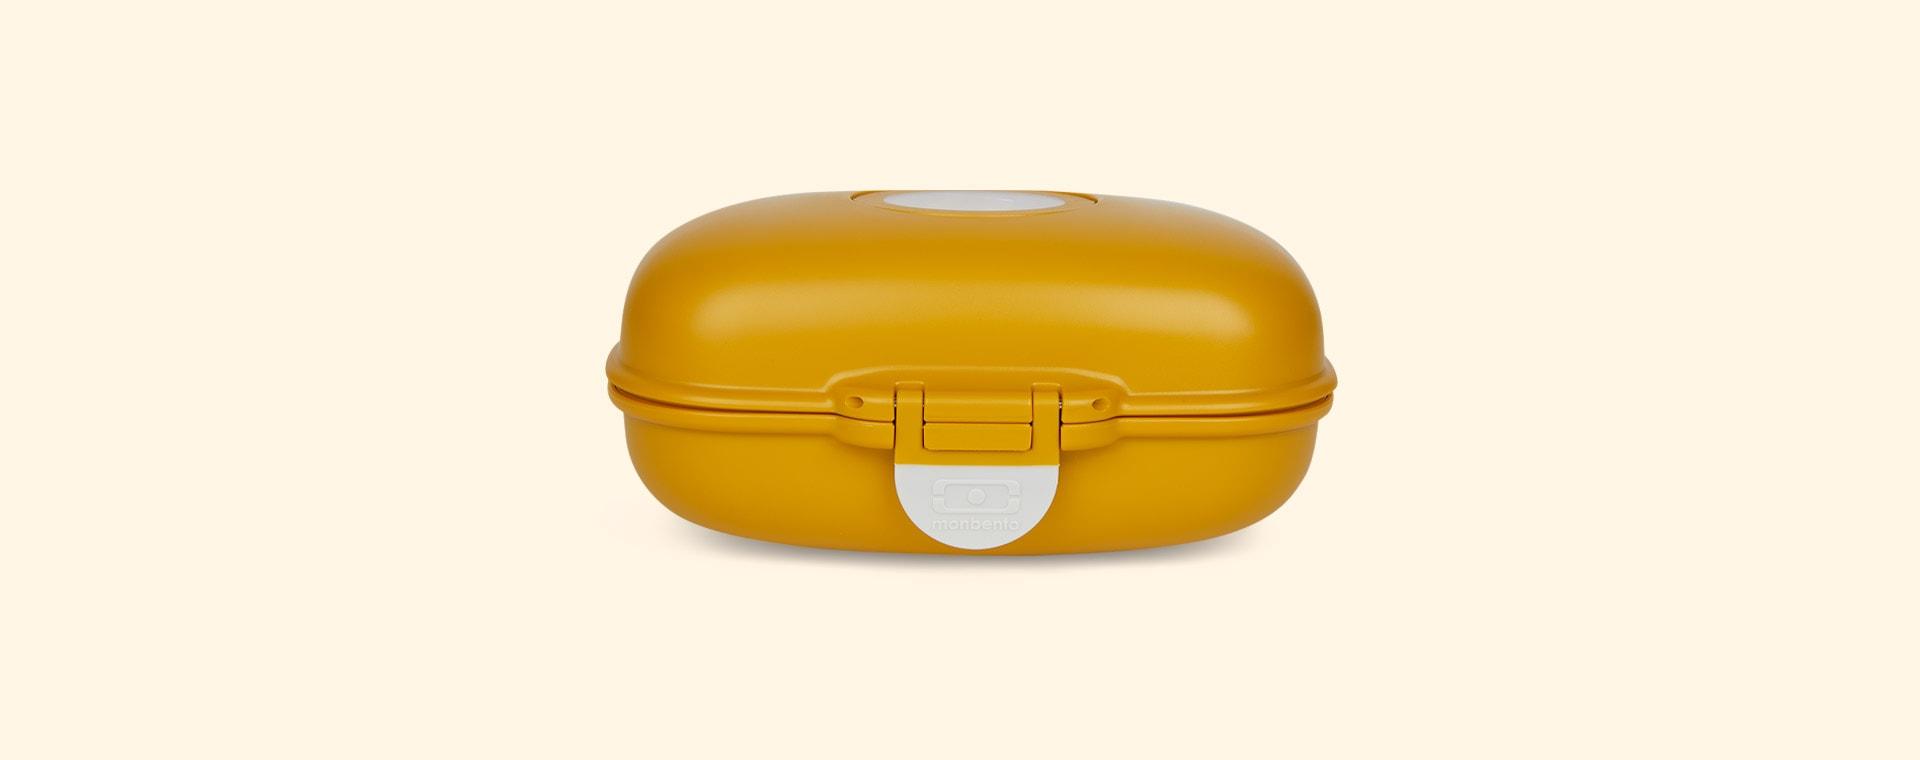 Mustard monbento Gram Snack Box